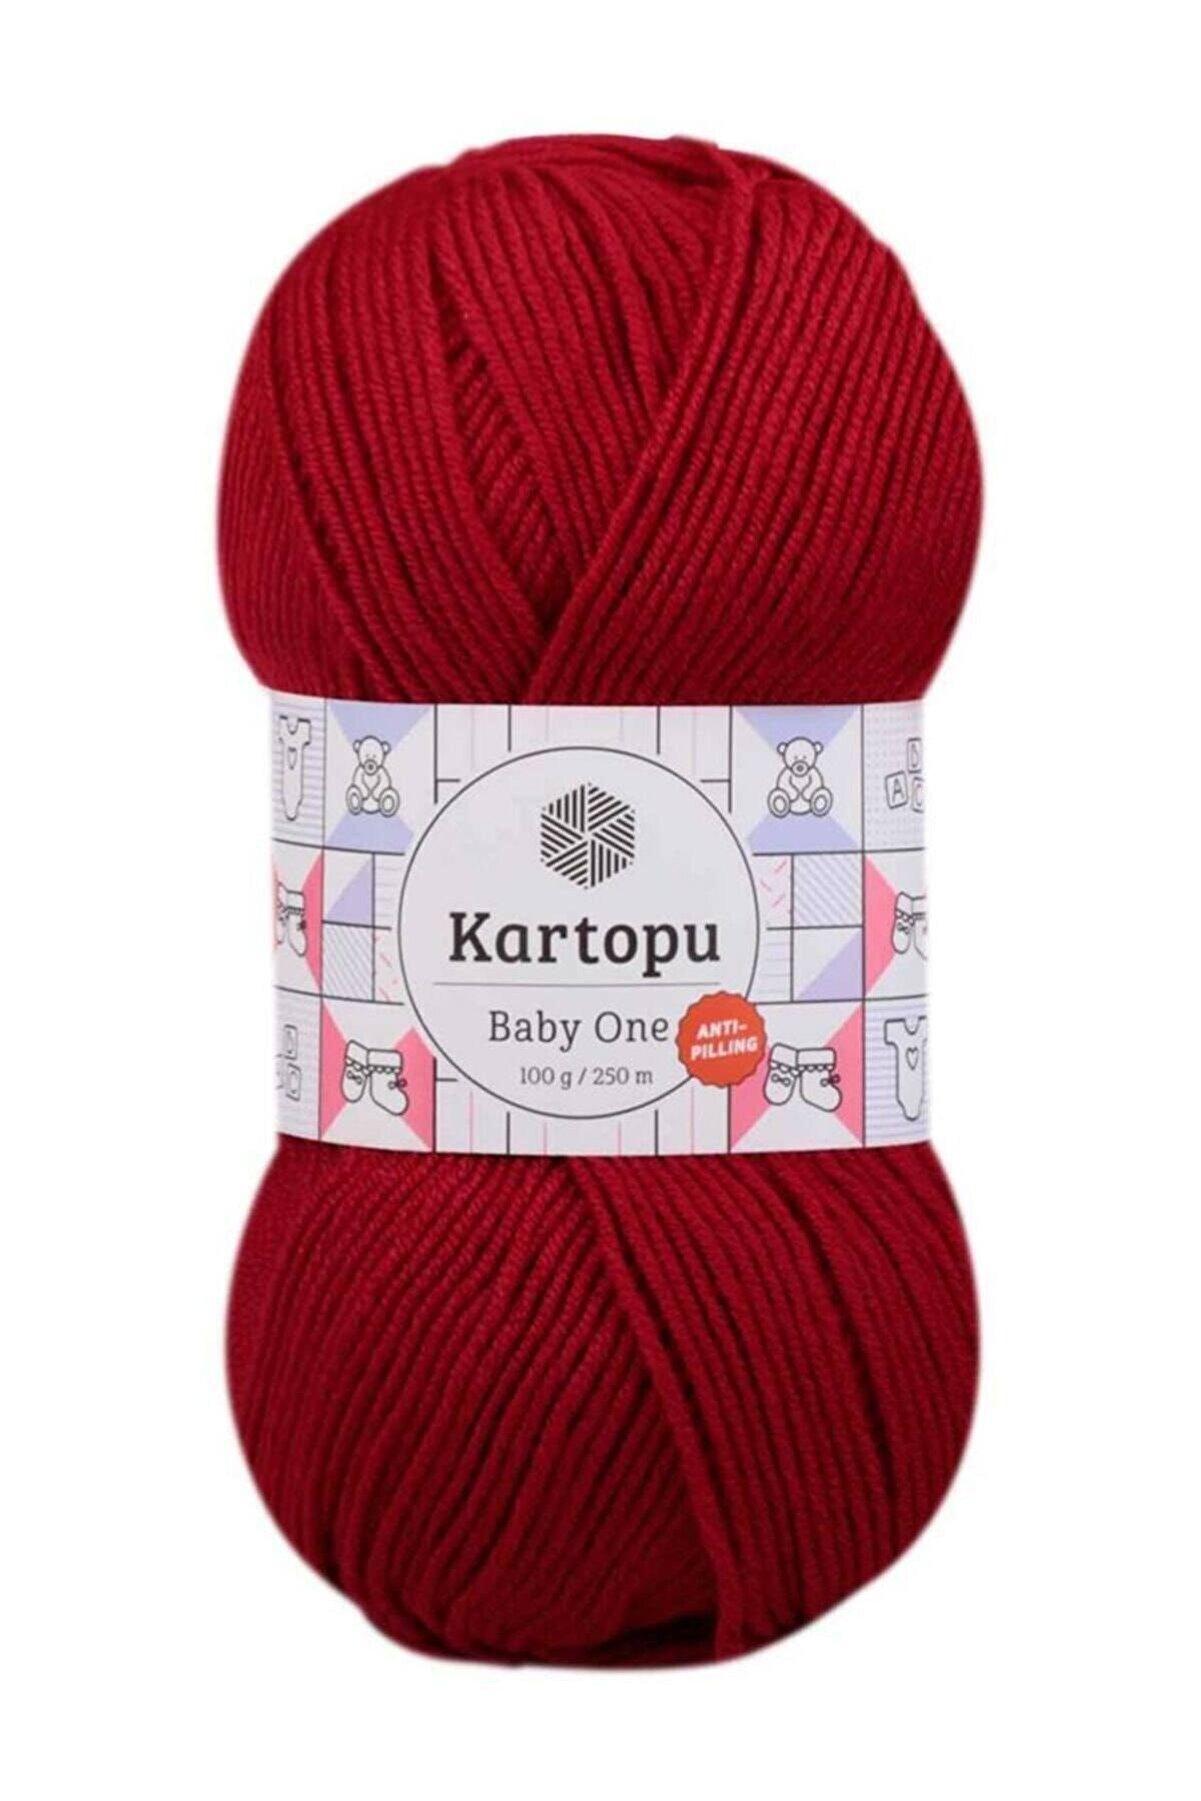 Kartopu Baby One Anti-pilling Örgü Ipi K129 Kırmızı